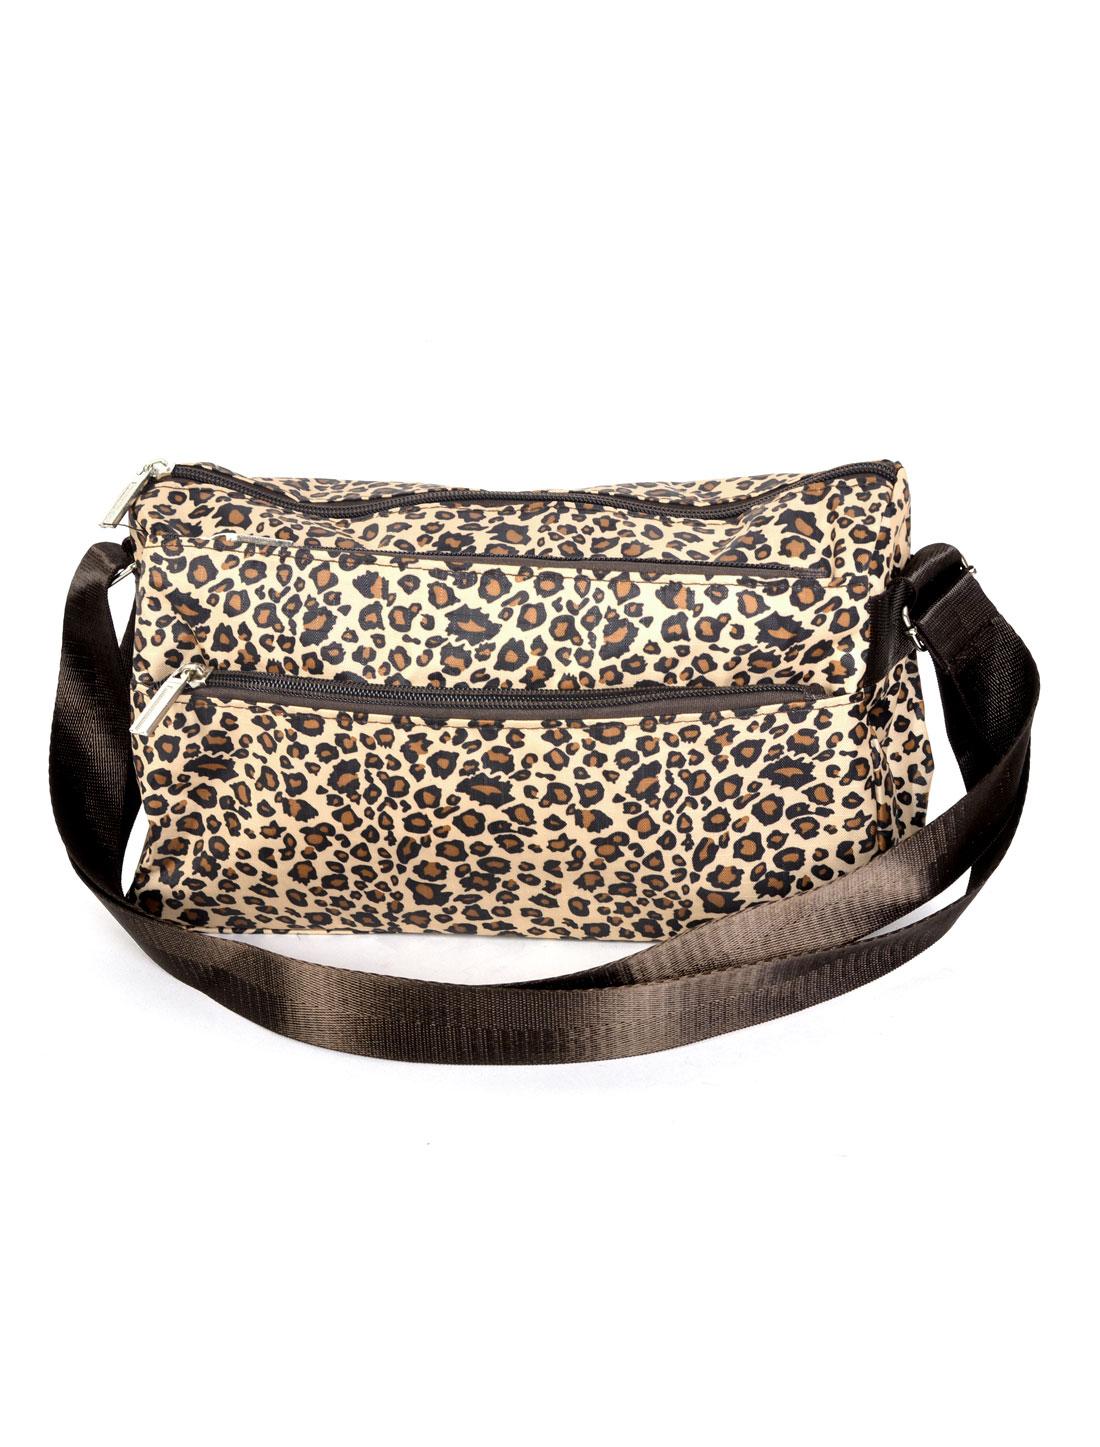 Lady Leopard Pattern Rectangle Shaped Zipper Closure Nylon Shoulder Bag Handbag